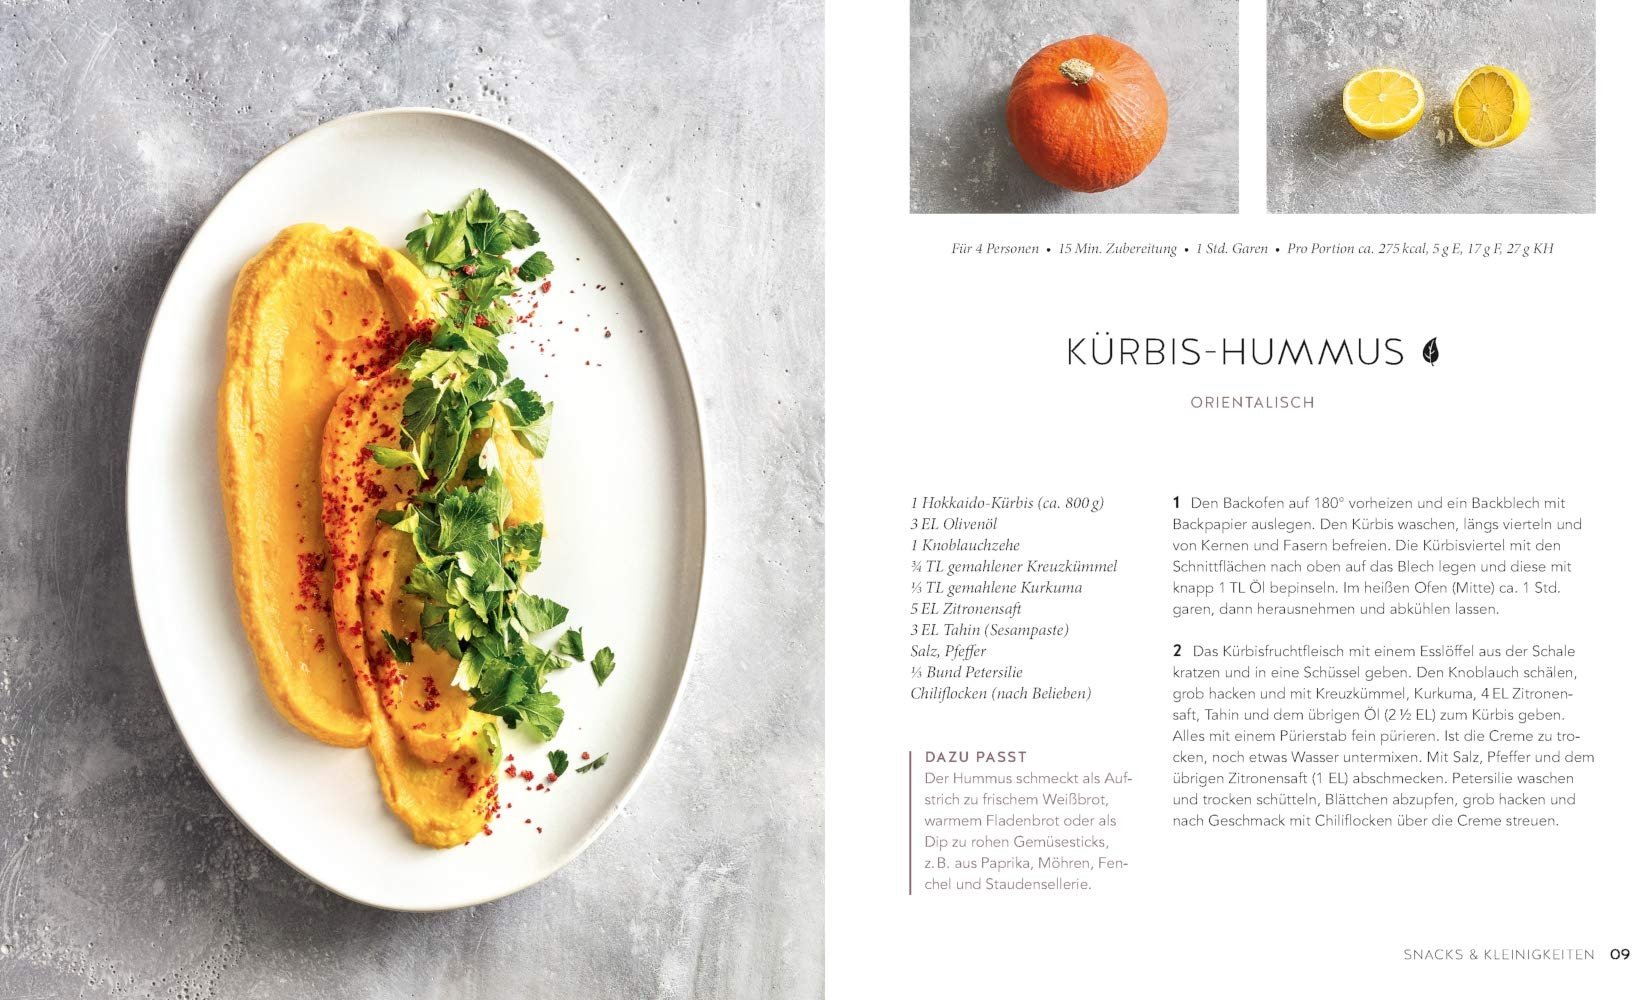 Sommerküche Gu : Dusy sommerküche kürbis gu küchenratgeber amazon tanja dusy